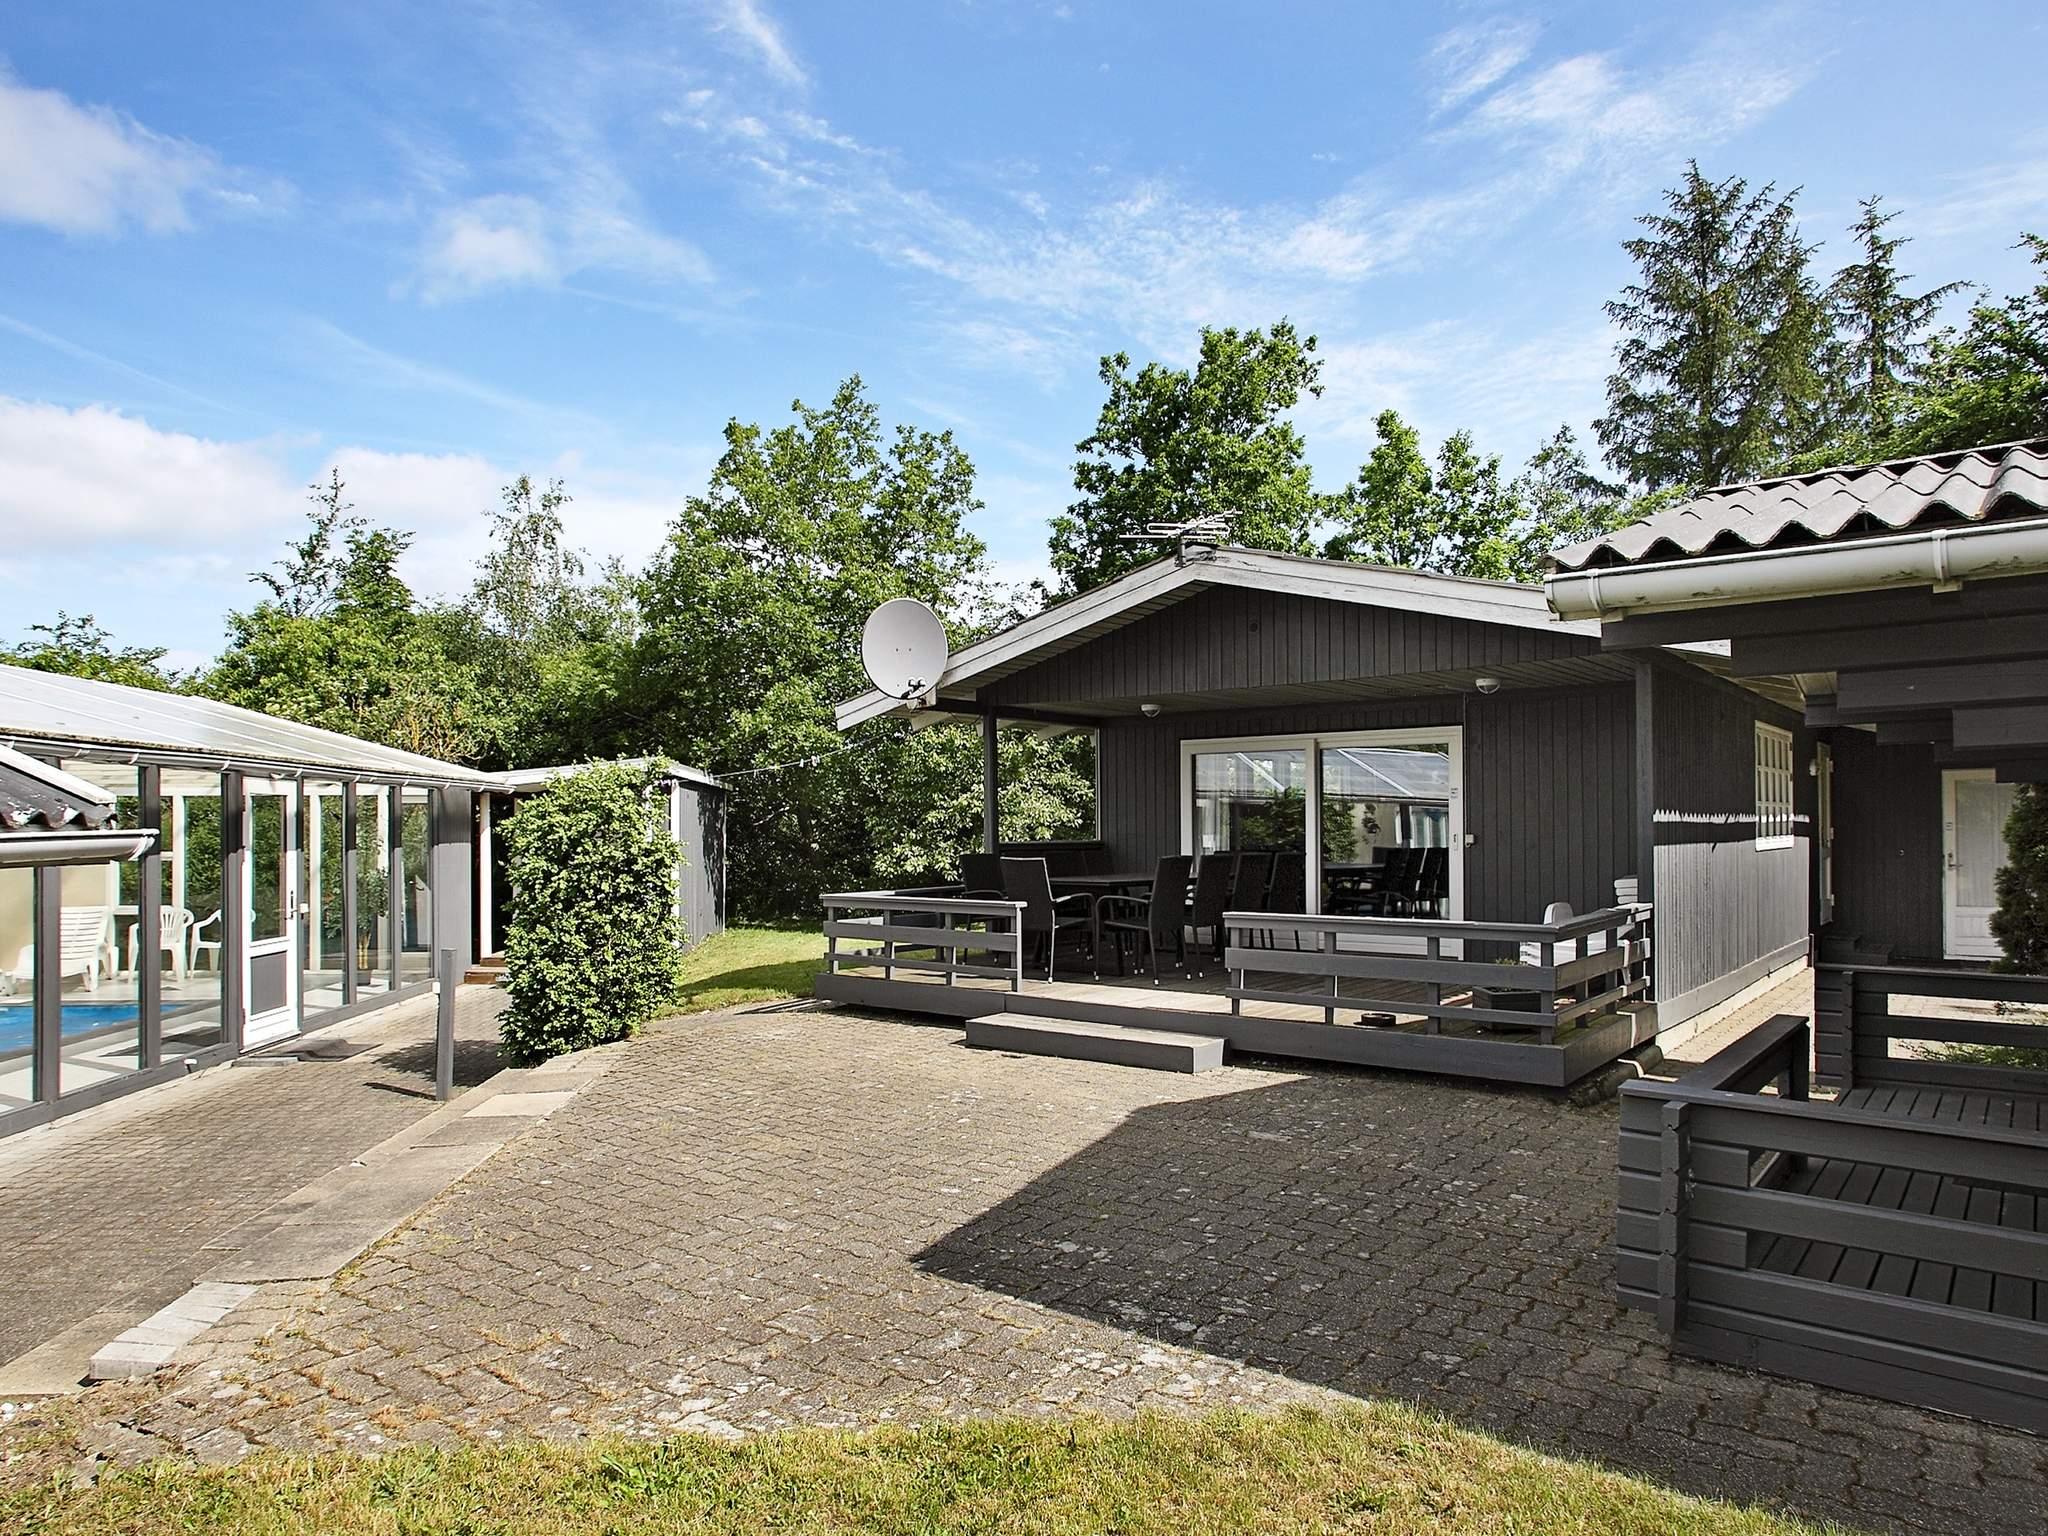 Ferienhaus Virksund (82997), Virksund, , Limfjord, Dänemark, Bild 1